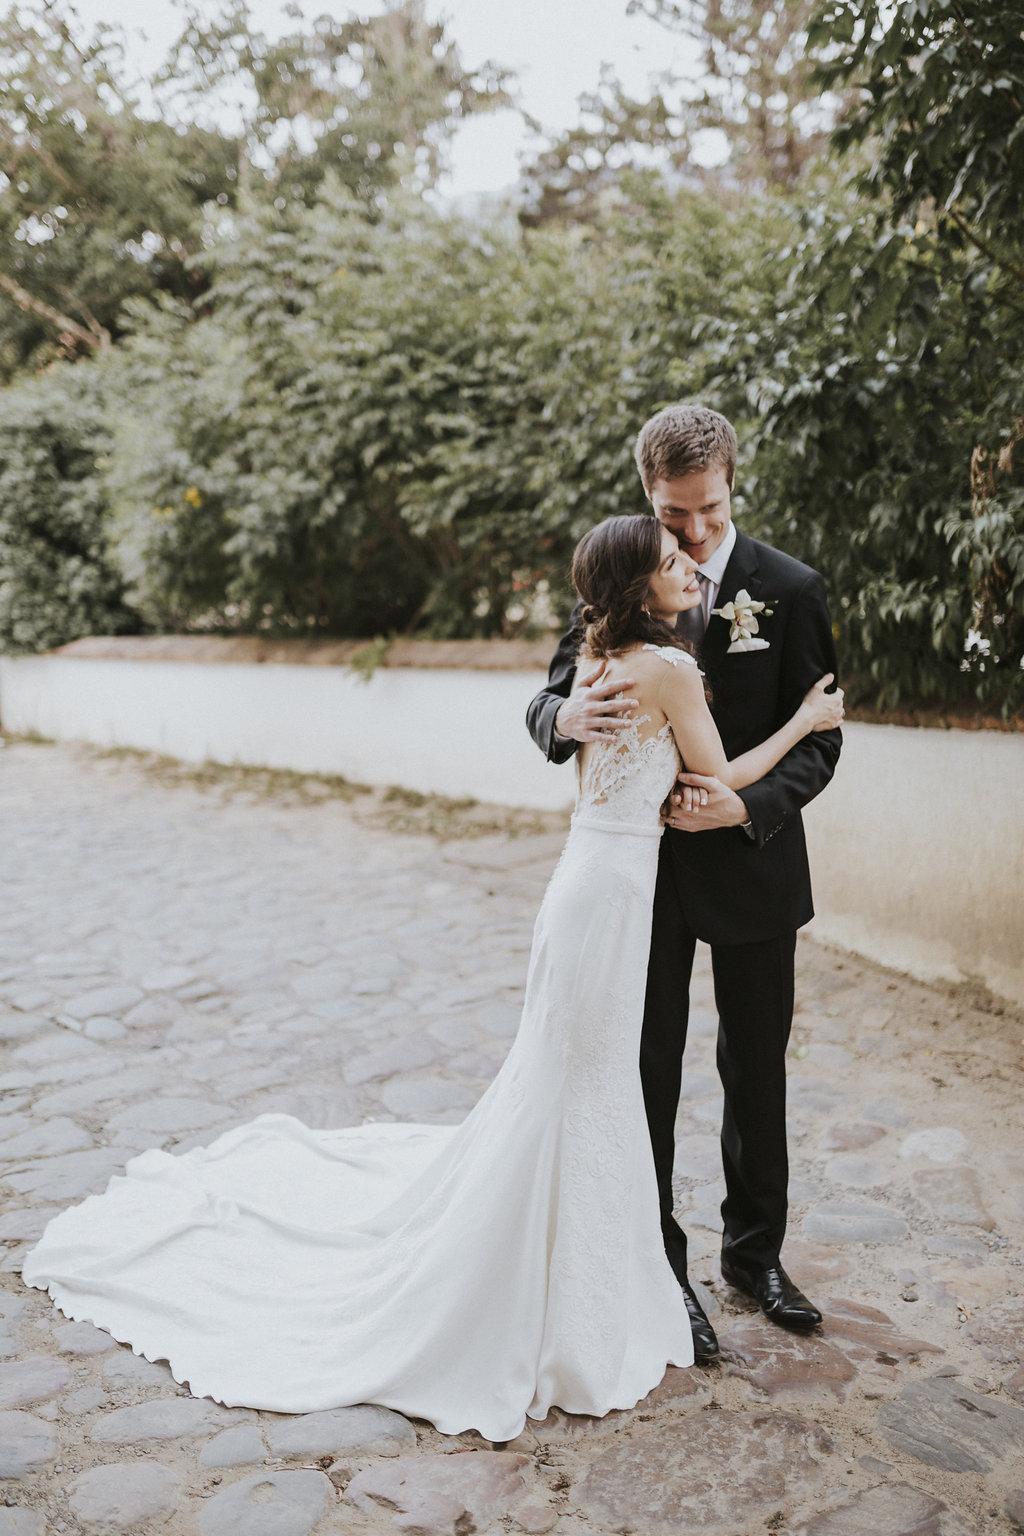 julieth-bravo-wedding-planner-boda-villadeleyva-colobia-boyaca-boda-destino-destination-wedding-serendipity-photo-pronovias-bride-dress.jpg